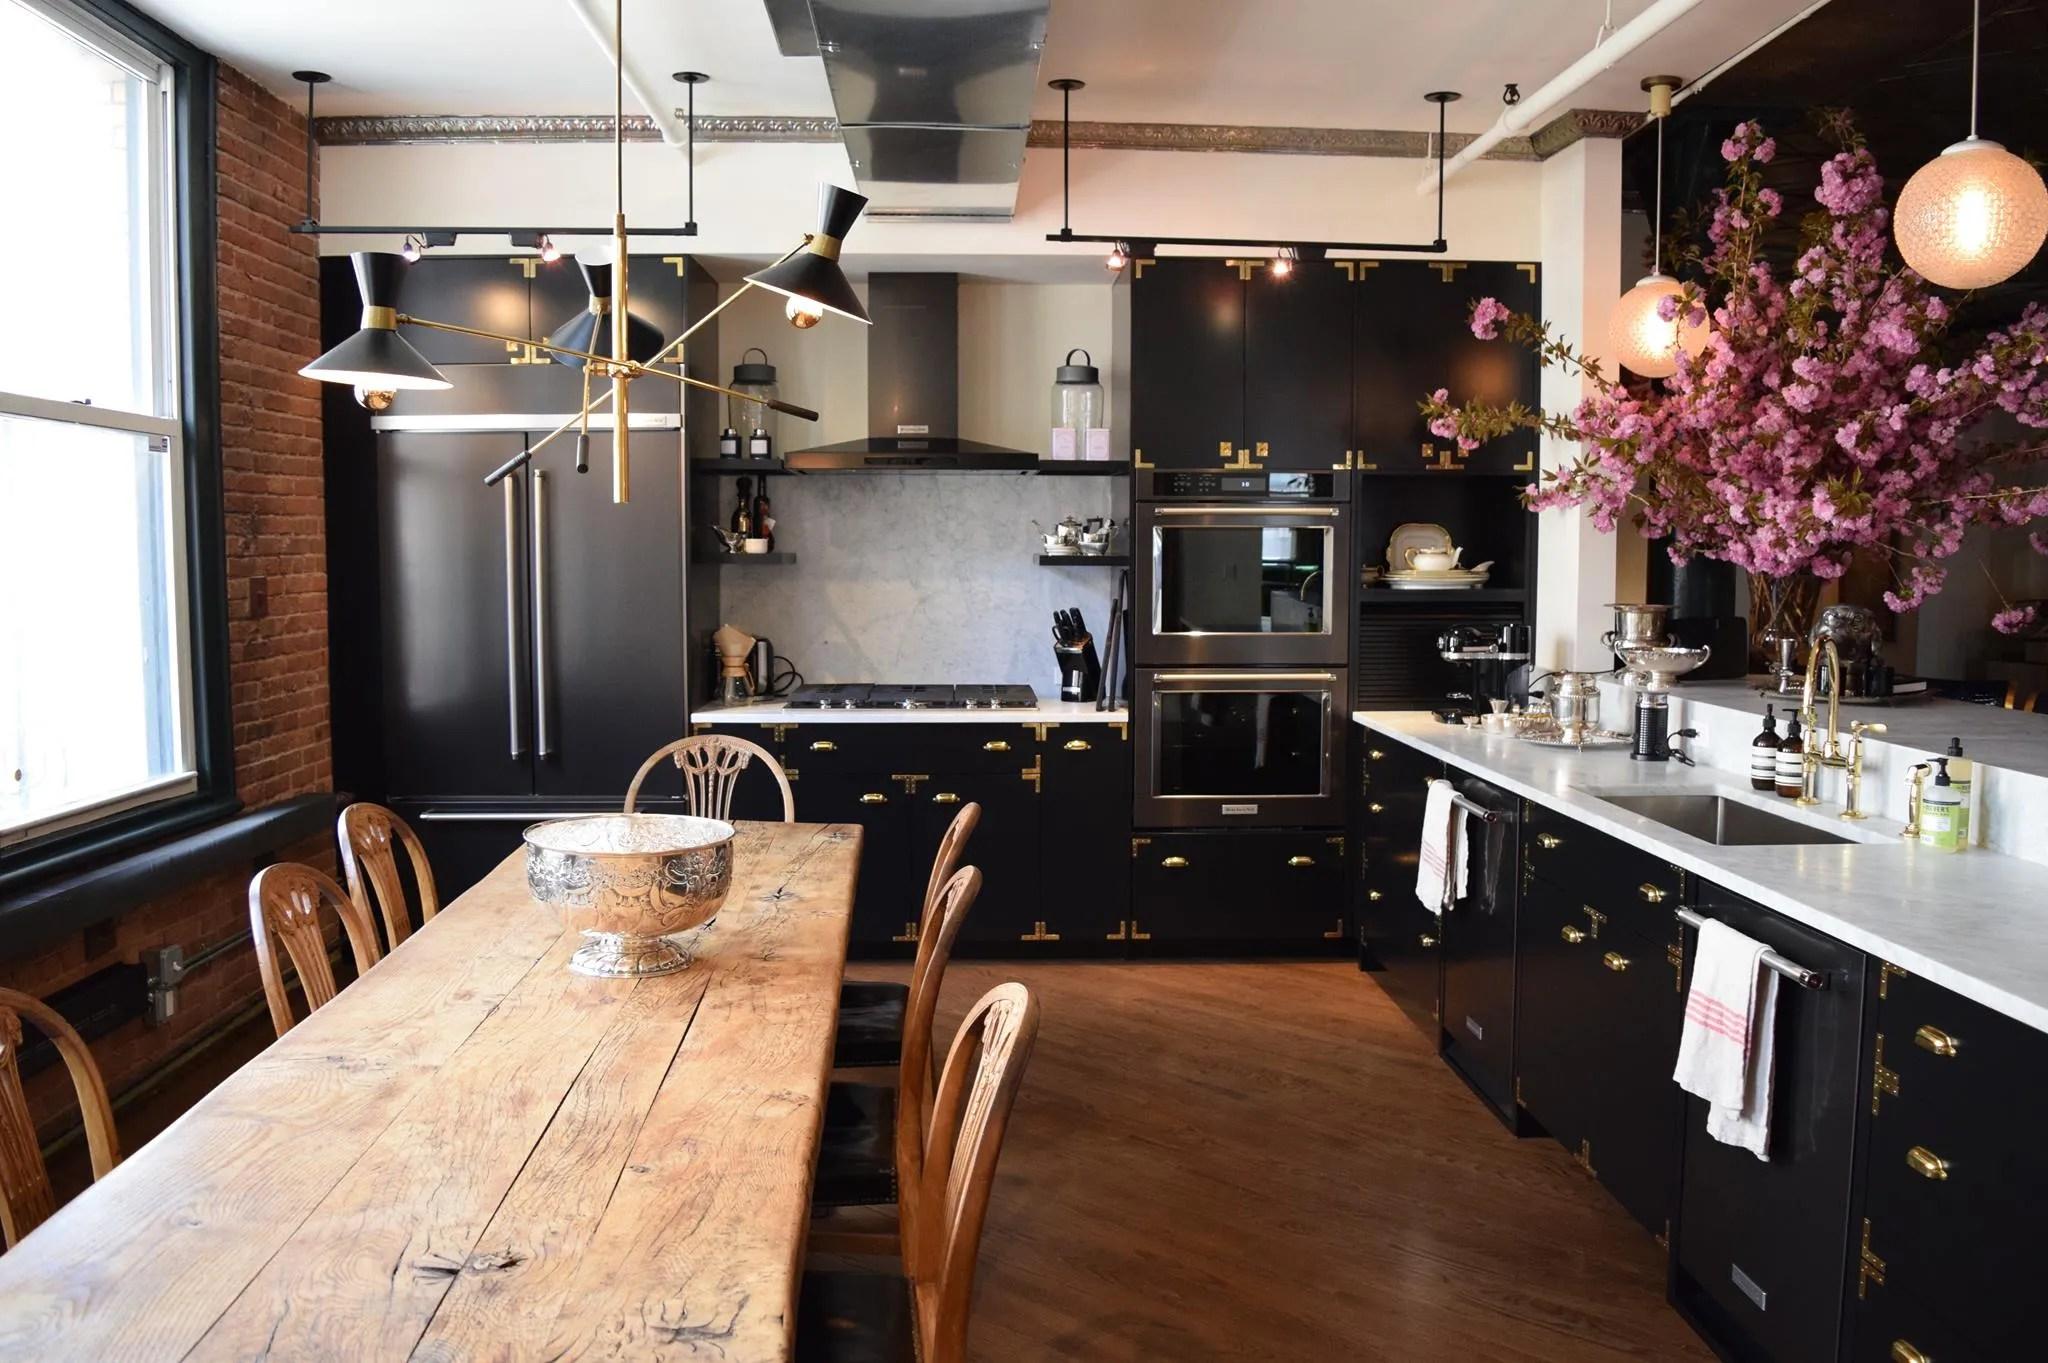 black kitchen appliances samsung reviews kitchenaid stainless steel cabinets